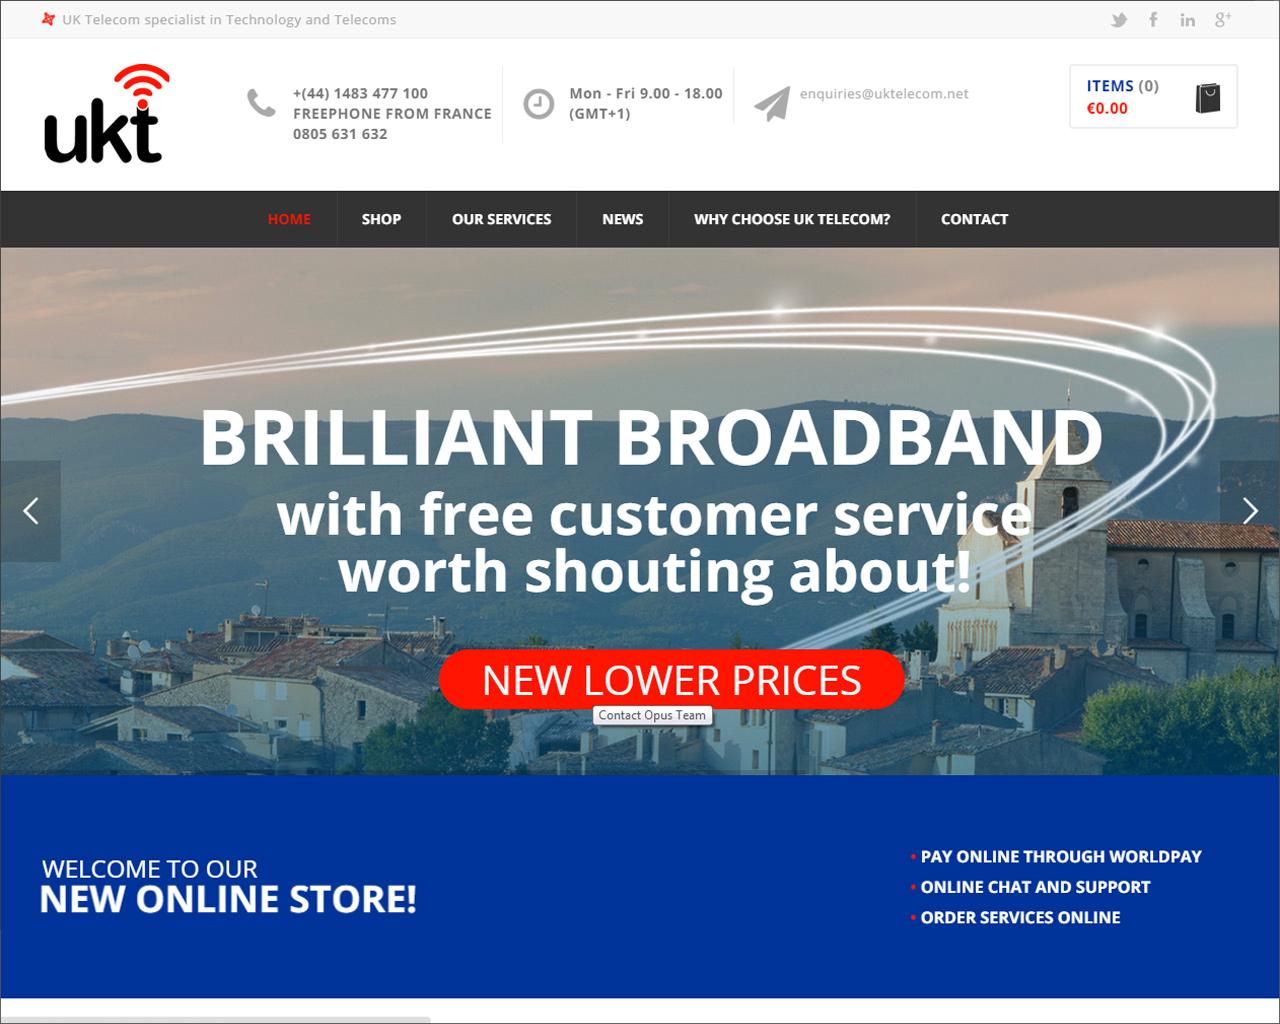 UK telecom